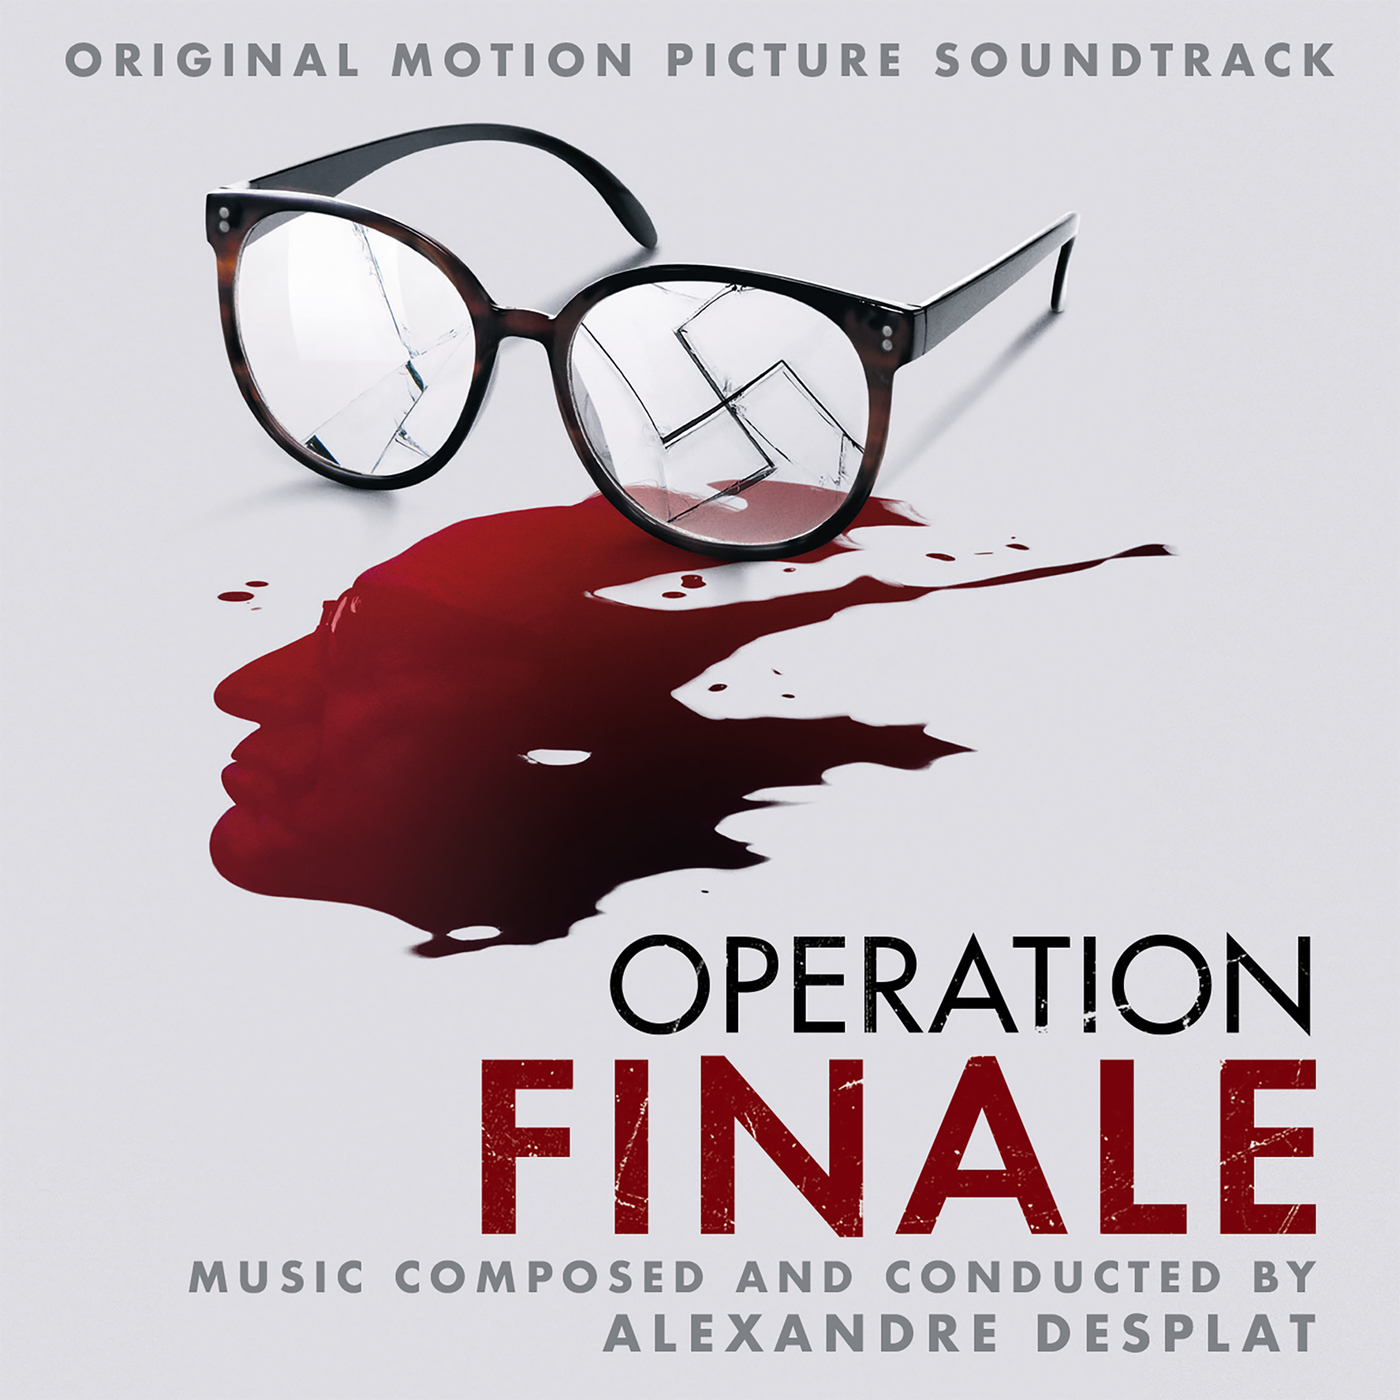 Operation Finale (Original Motion Picture Soundtrack) - Alexandre Desplat